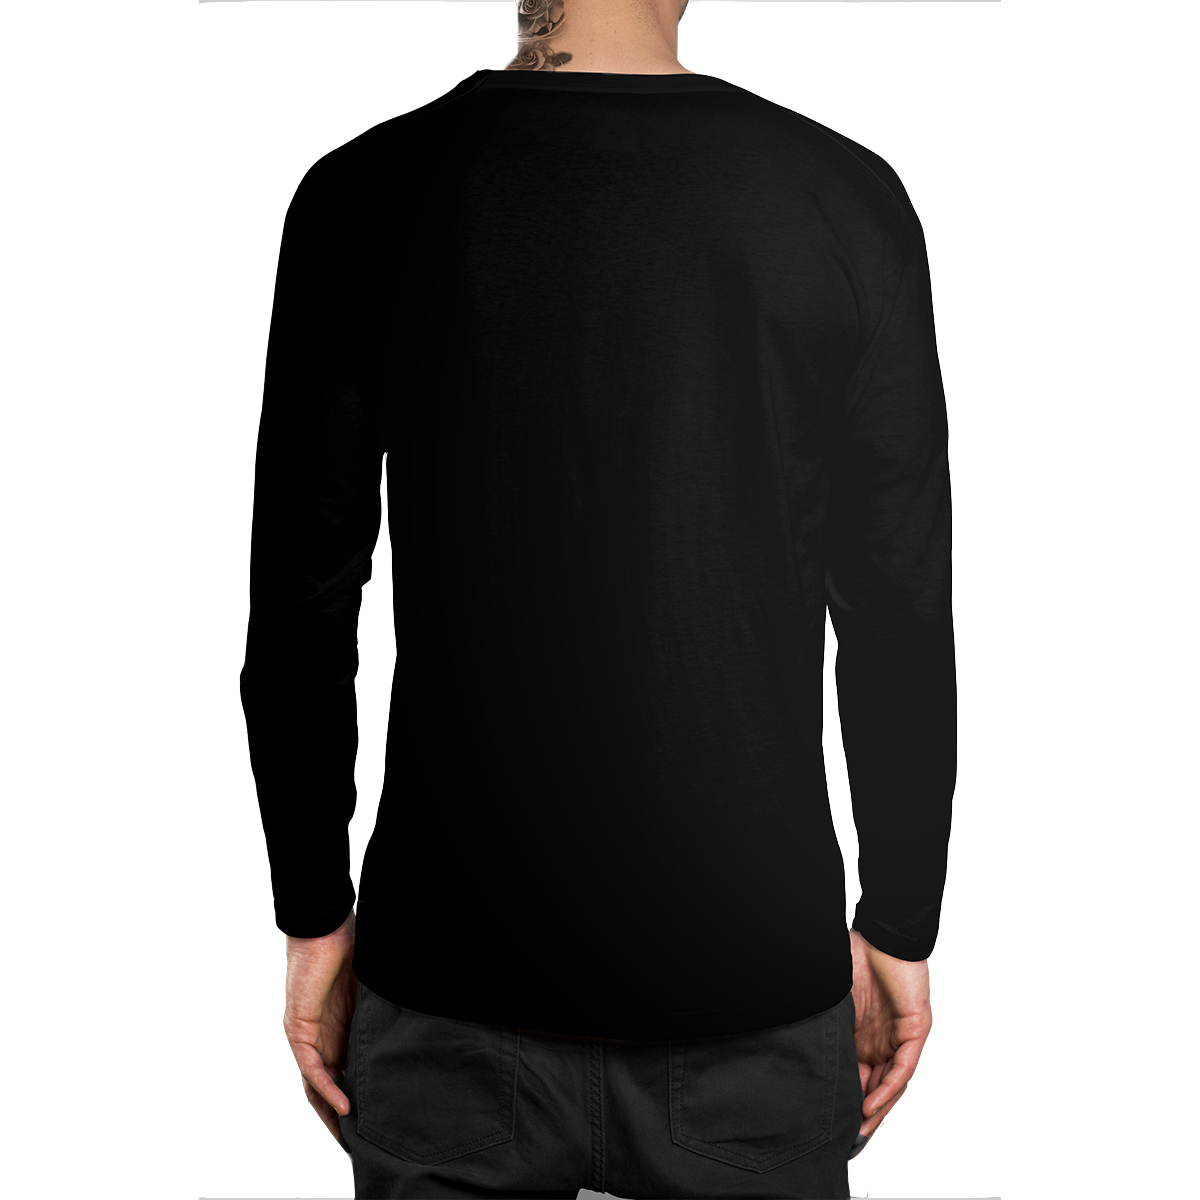 Stompy Camiseta Manga Longa Modelo 32